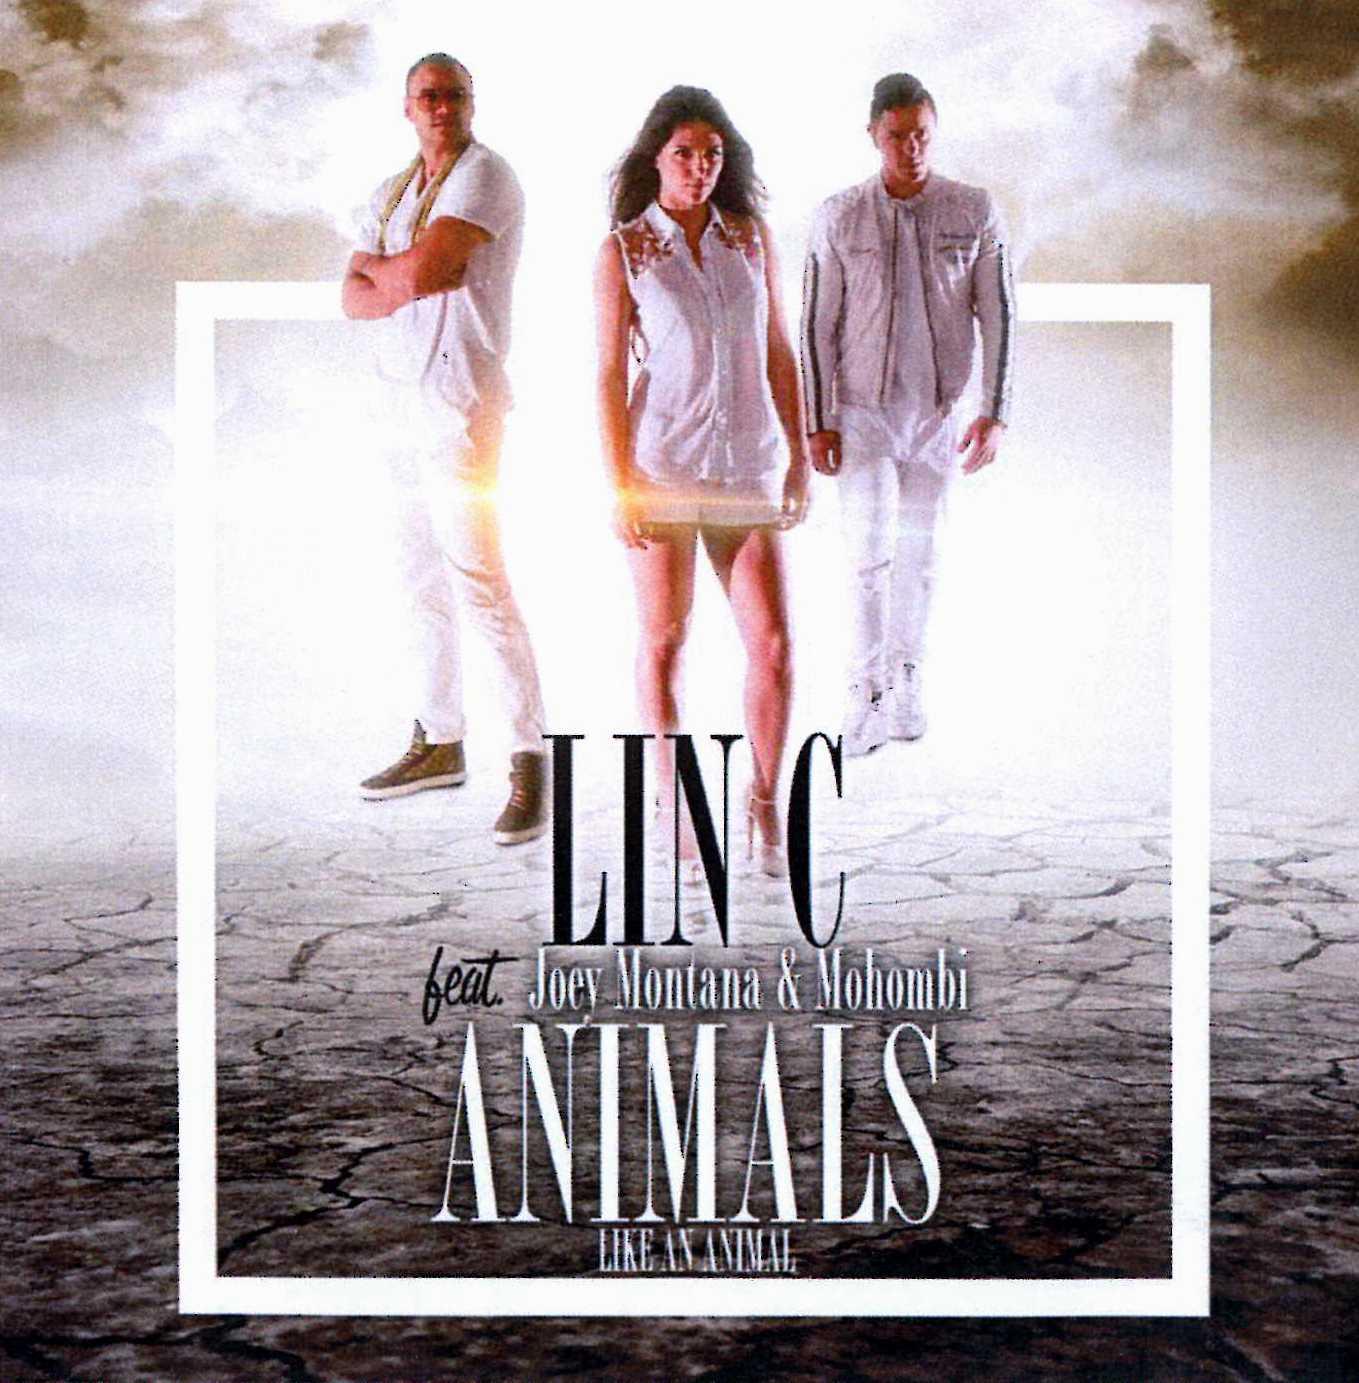 Animals (Like an animal)